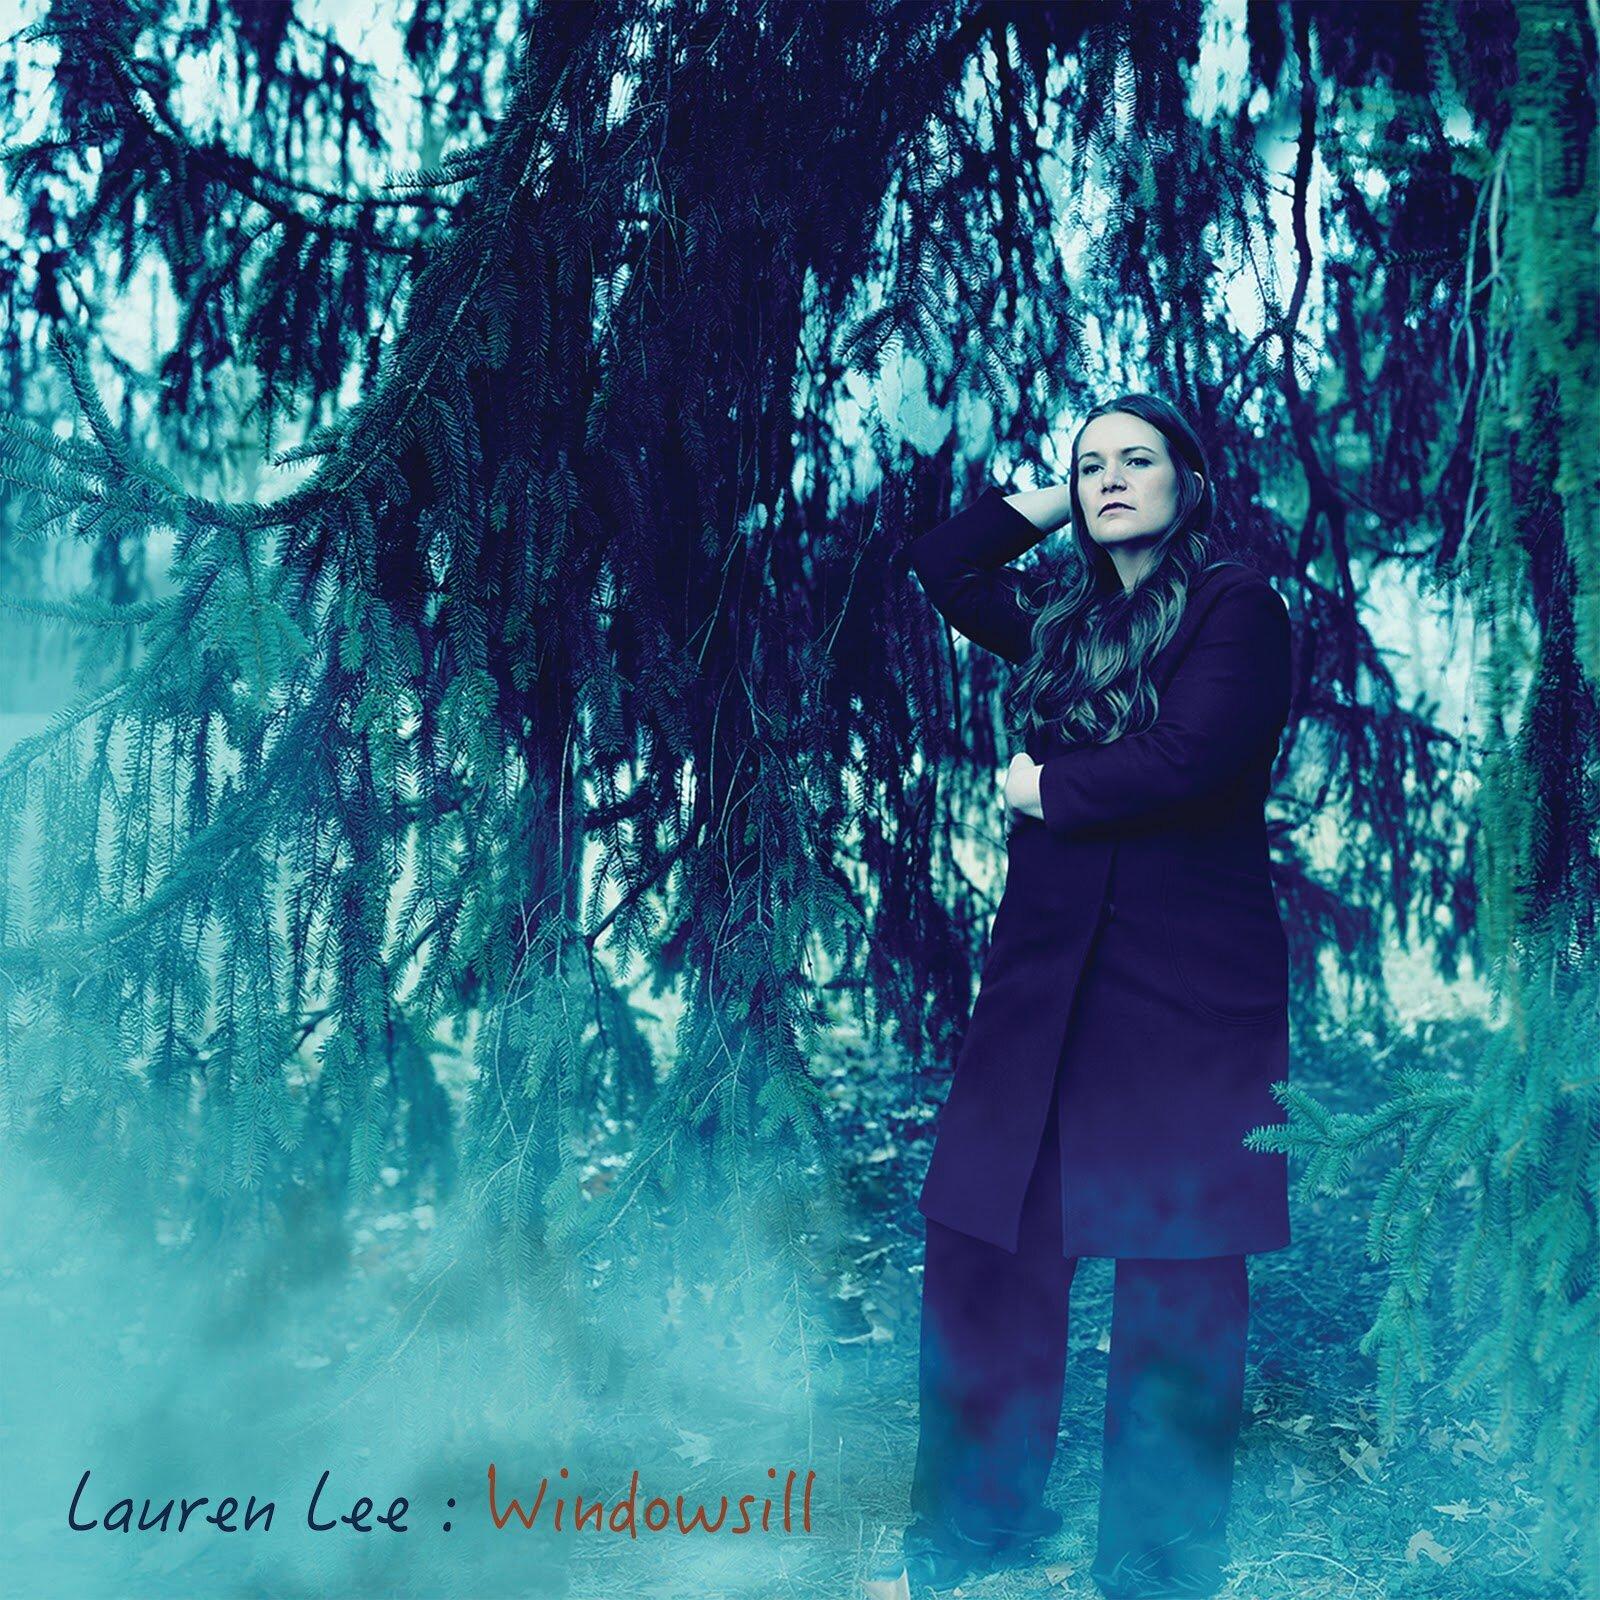 Lauren_Lee_Windowsill_Cover.jpg